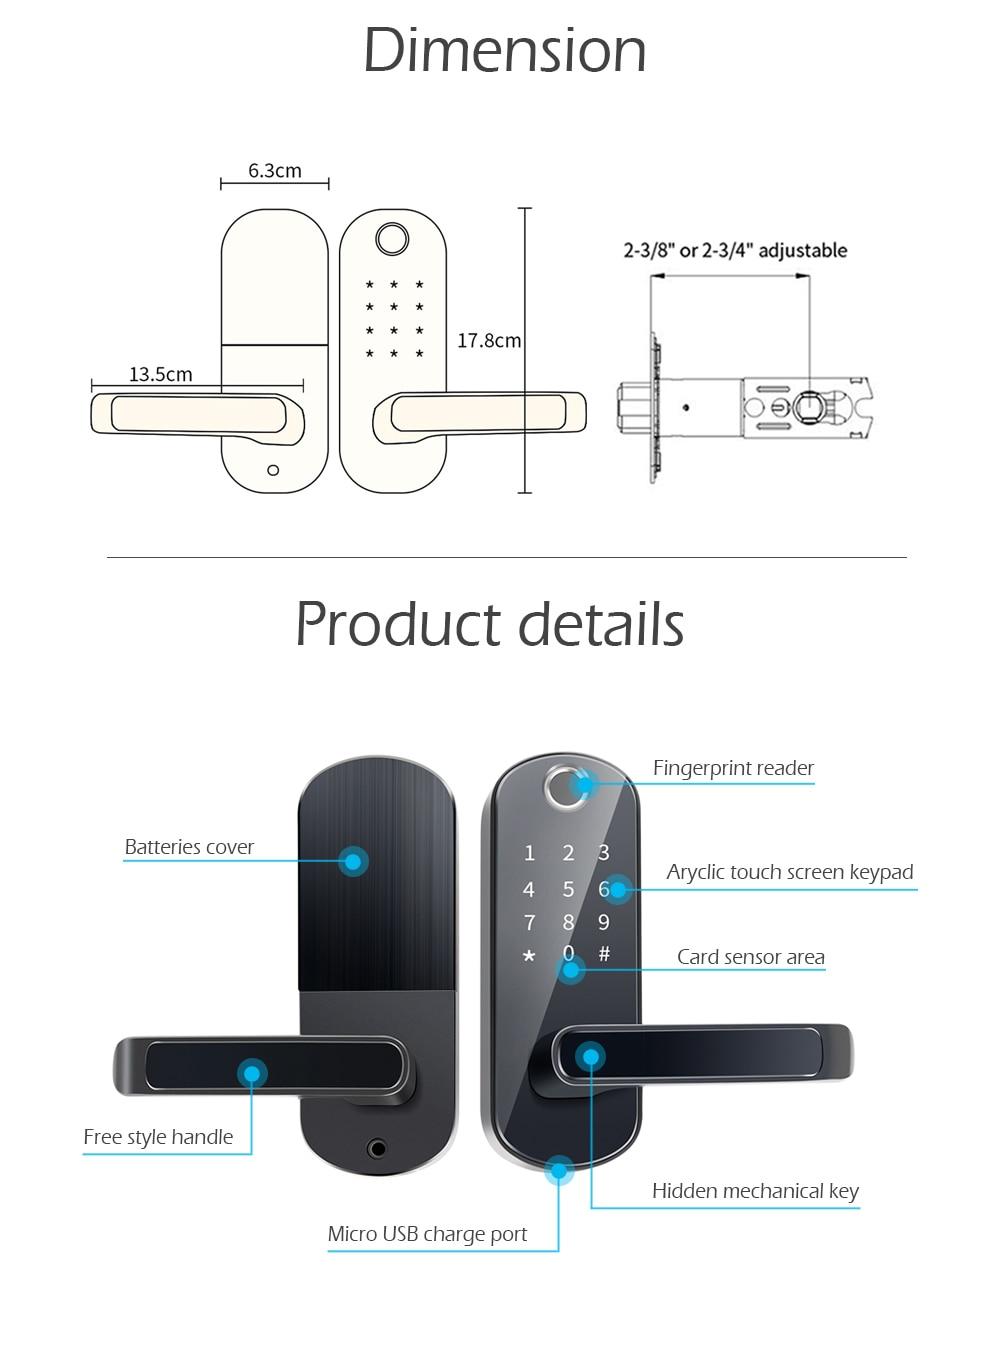 Heb296d79a1ad40e5ae3d2bc91eb84f8dc TTlock app fingerprint smart lock, wifi App waterproof button pincode Keypad electronic door lock, biometric remote control lock